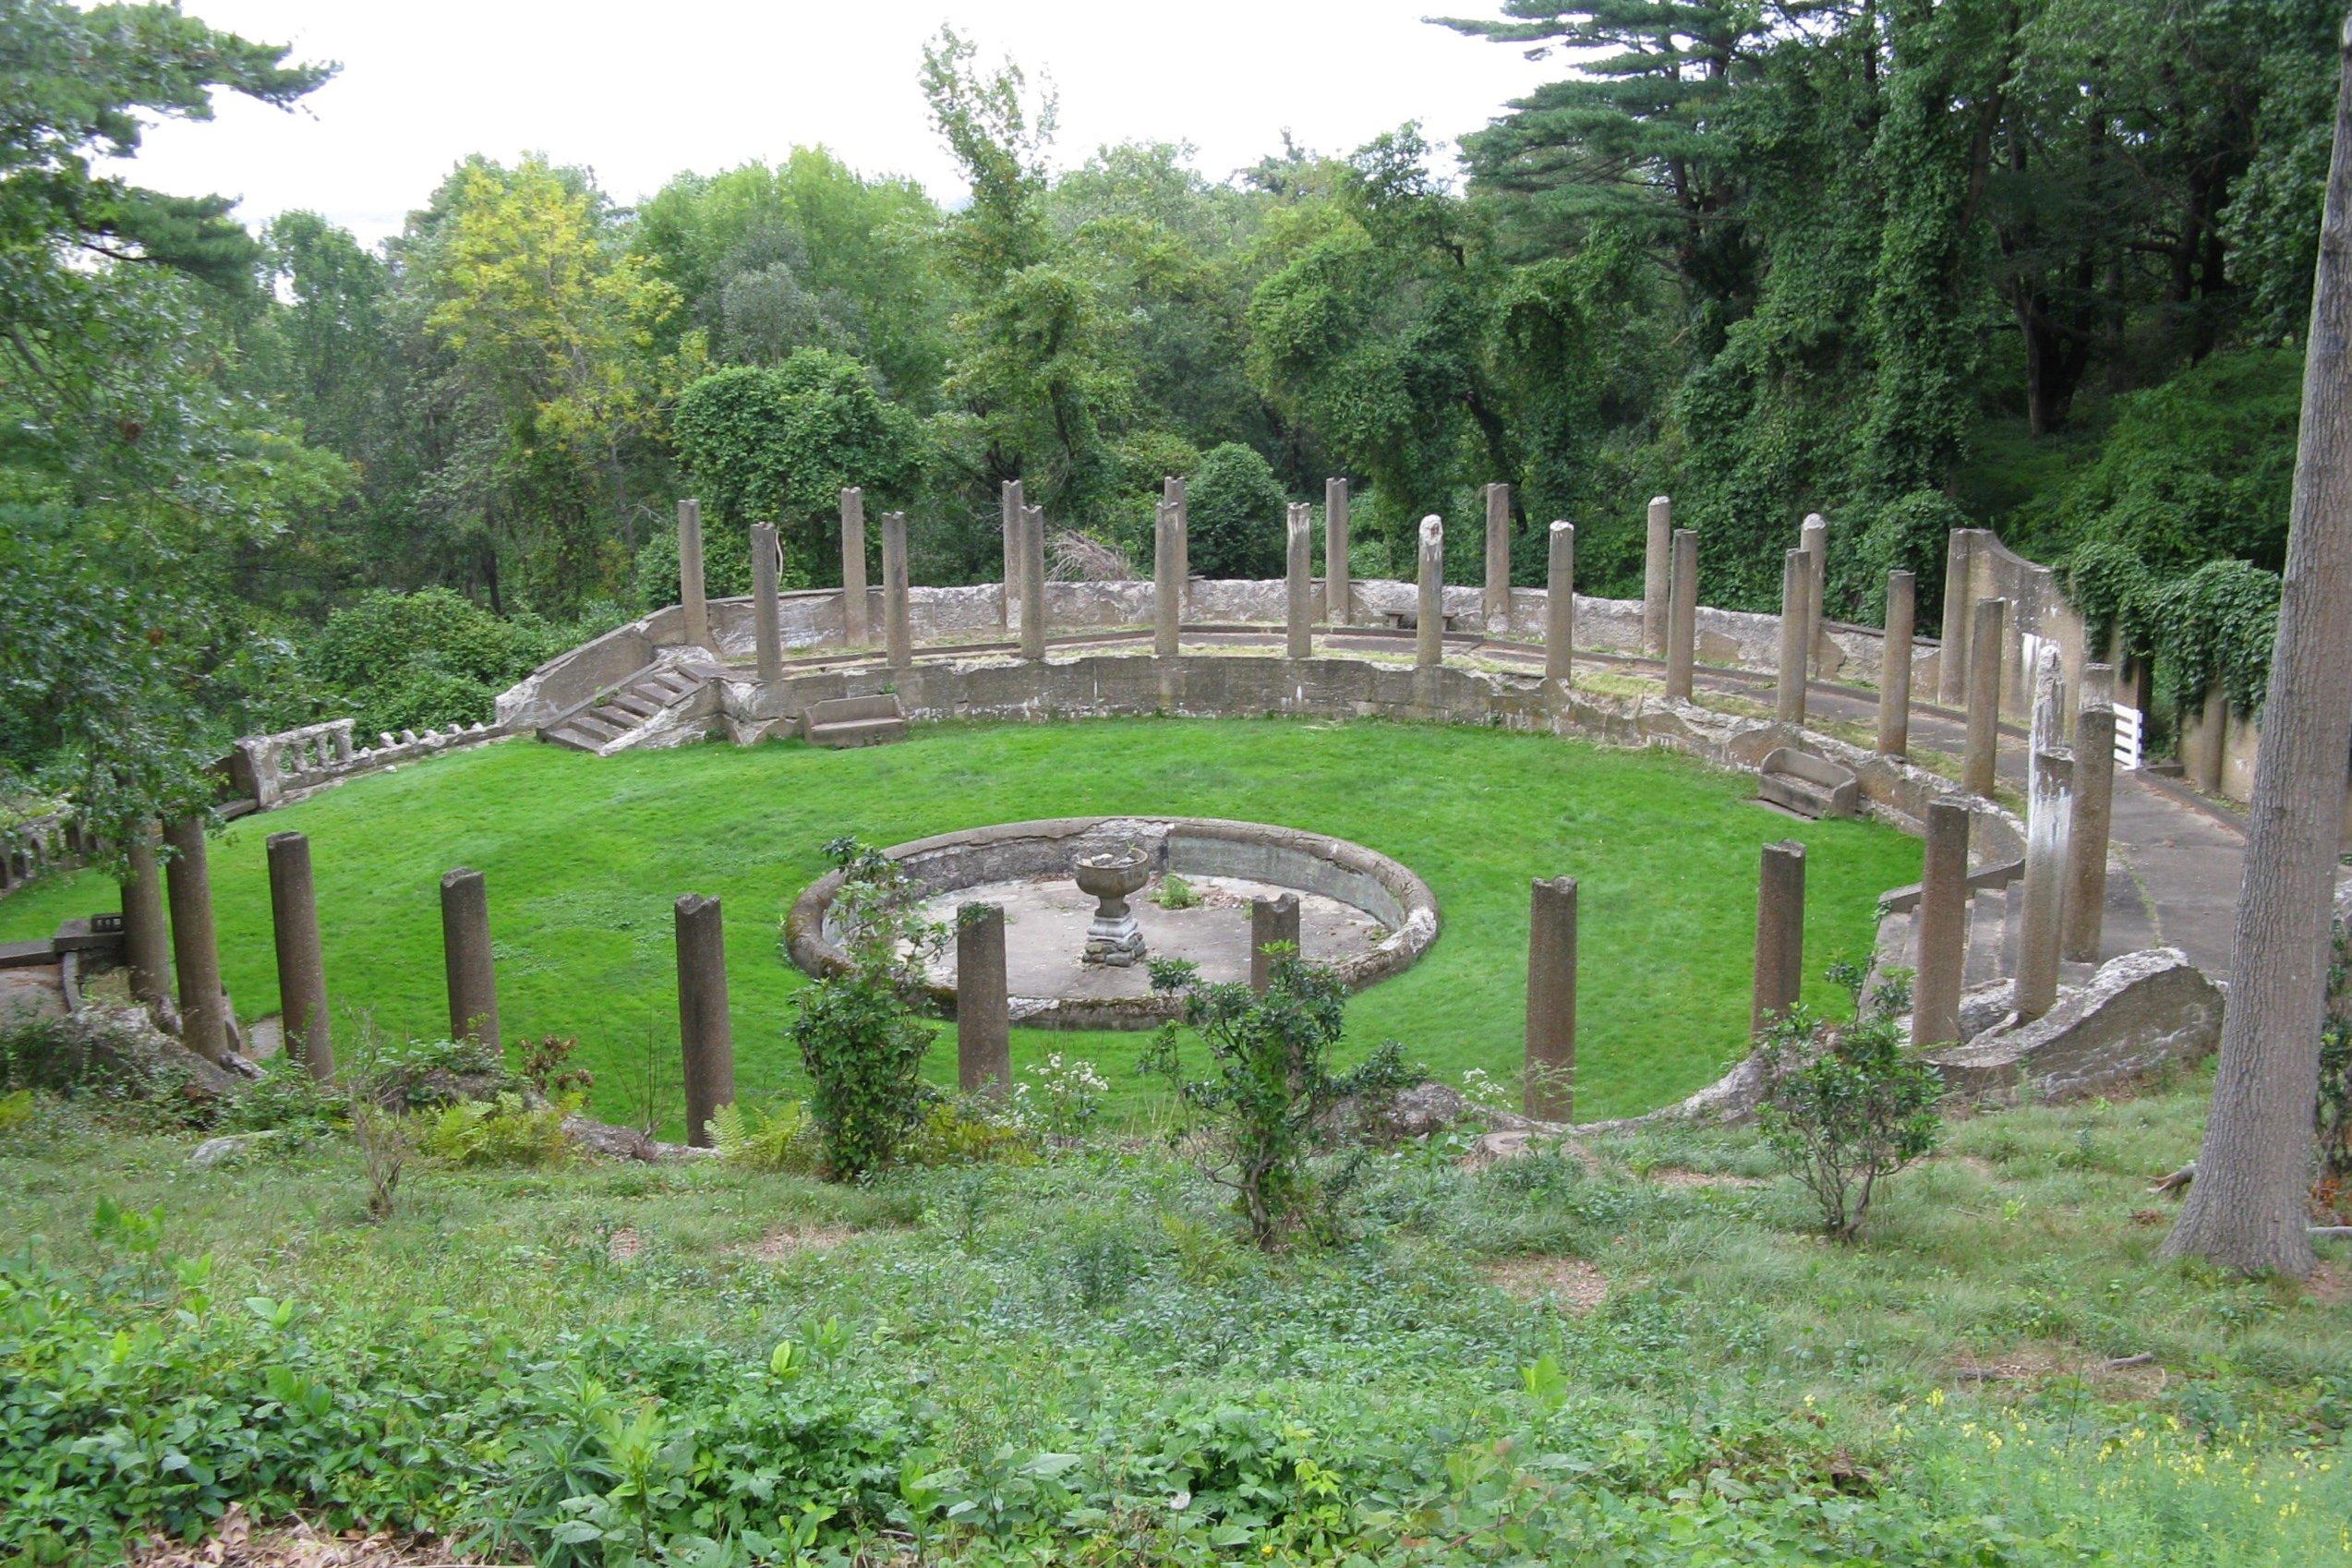 File:Rose Garden, Castle Hill, Ipswich MA